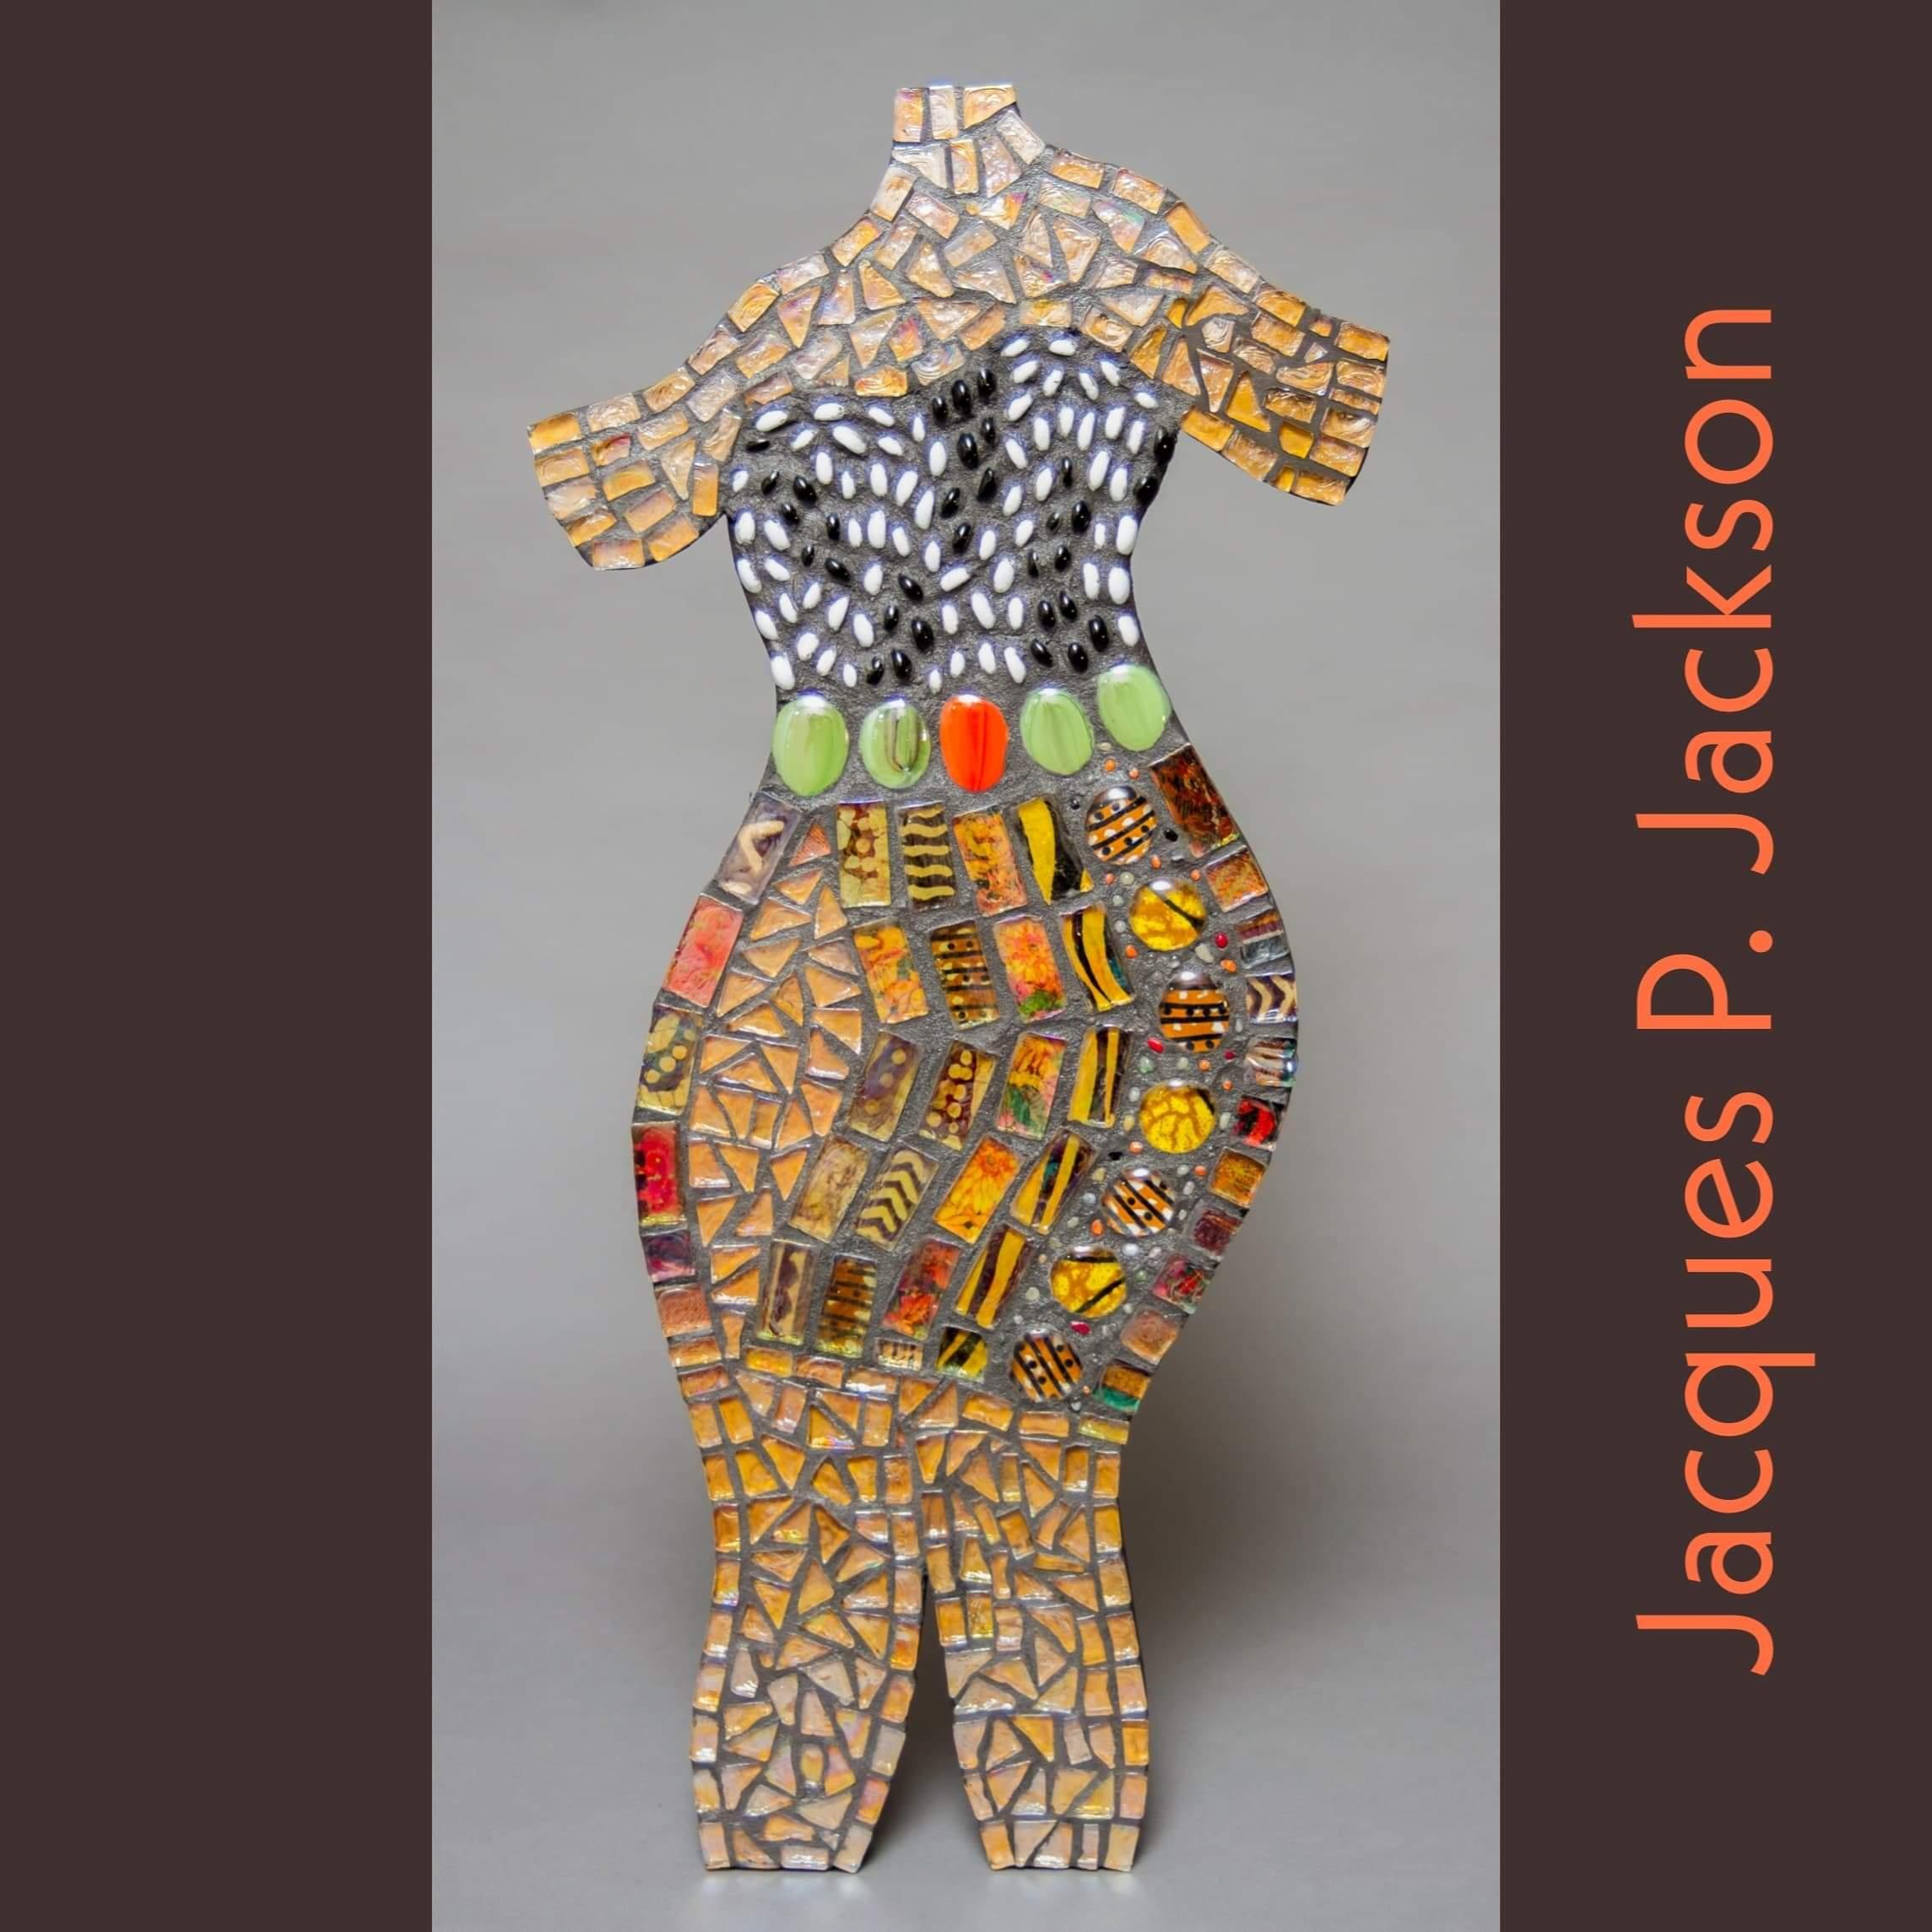 Jacques Jackson Art #2